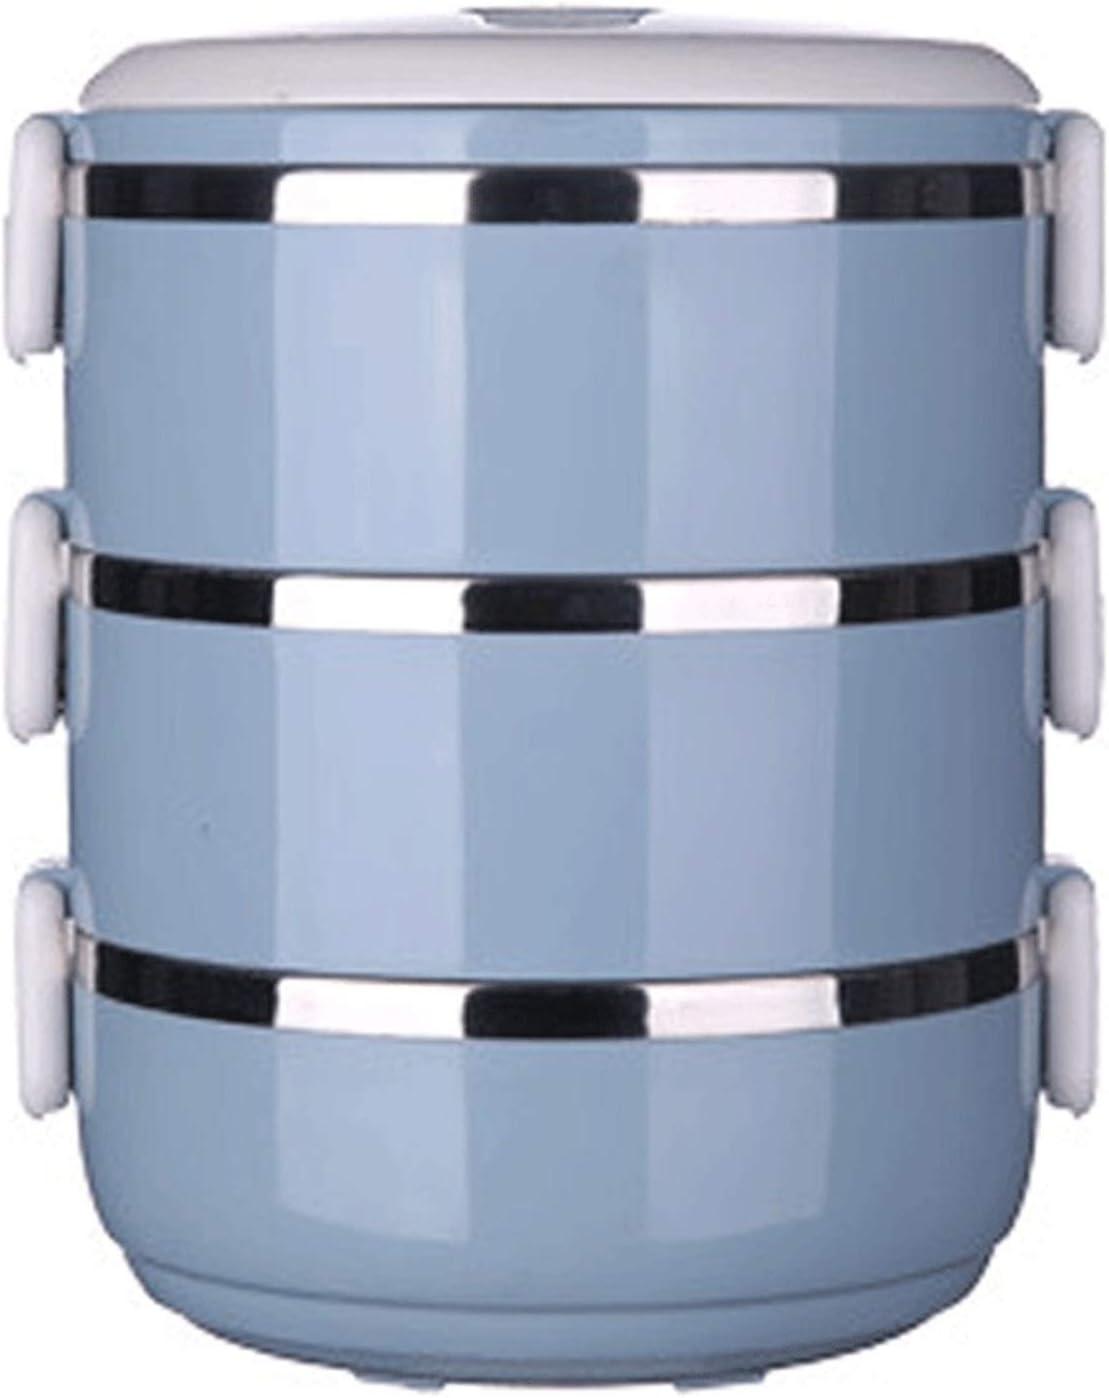 AHAI YU Caja de almuerzo de acero inoxidable, doble redondo para estudiantes, caja de bento sellada para oficina o camping (color: azul)